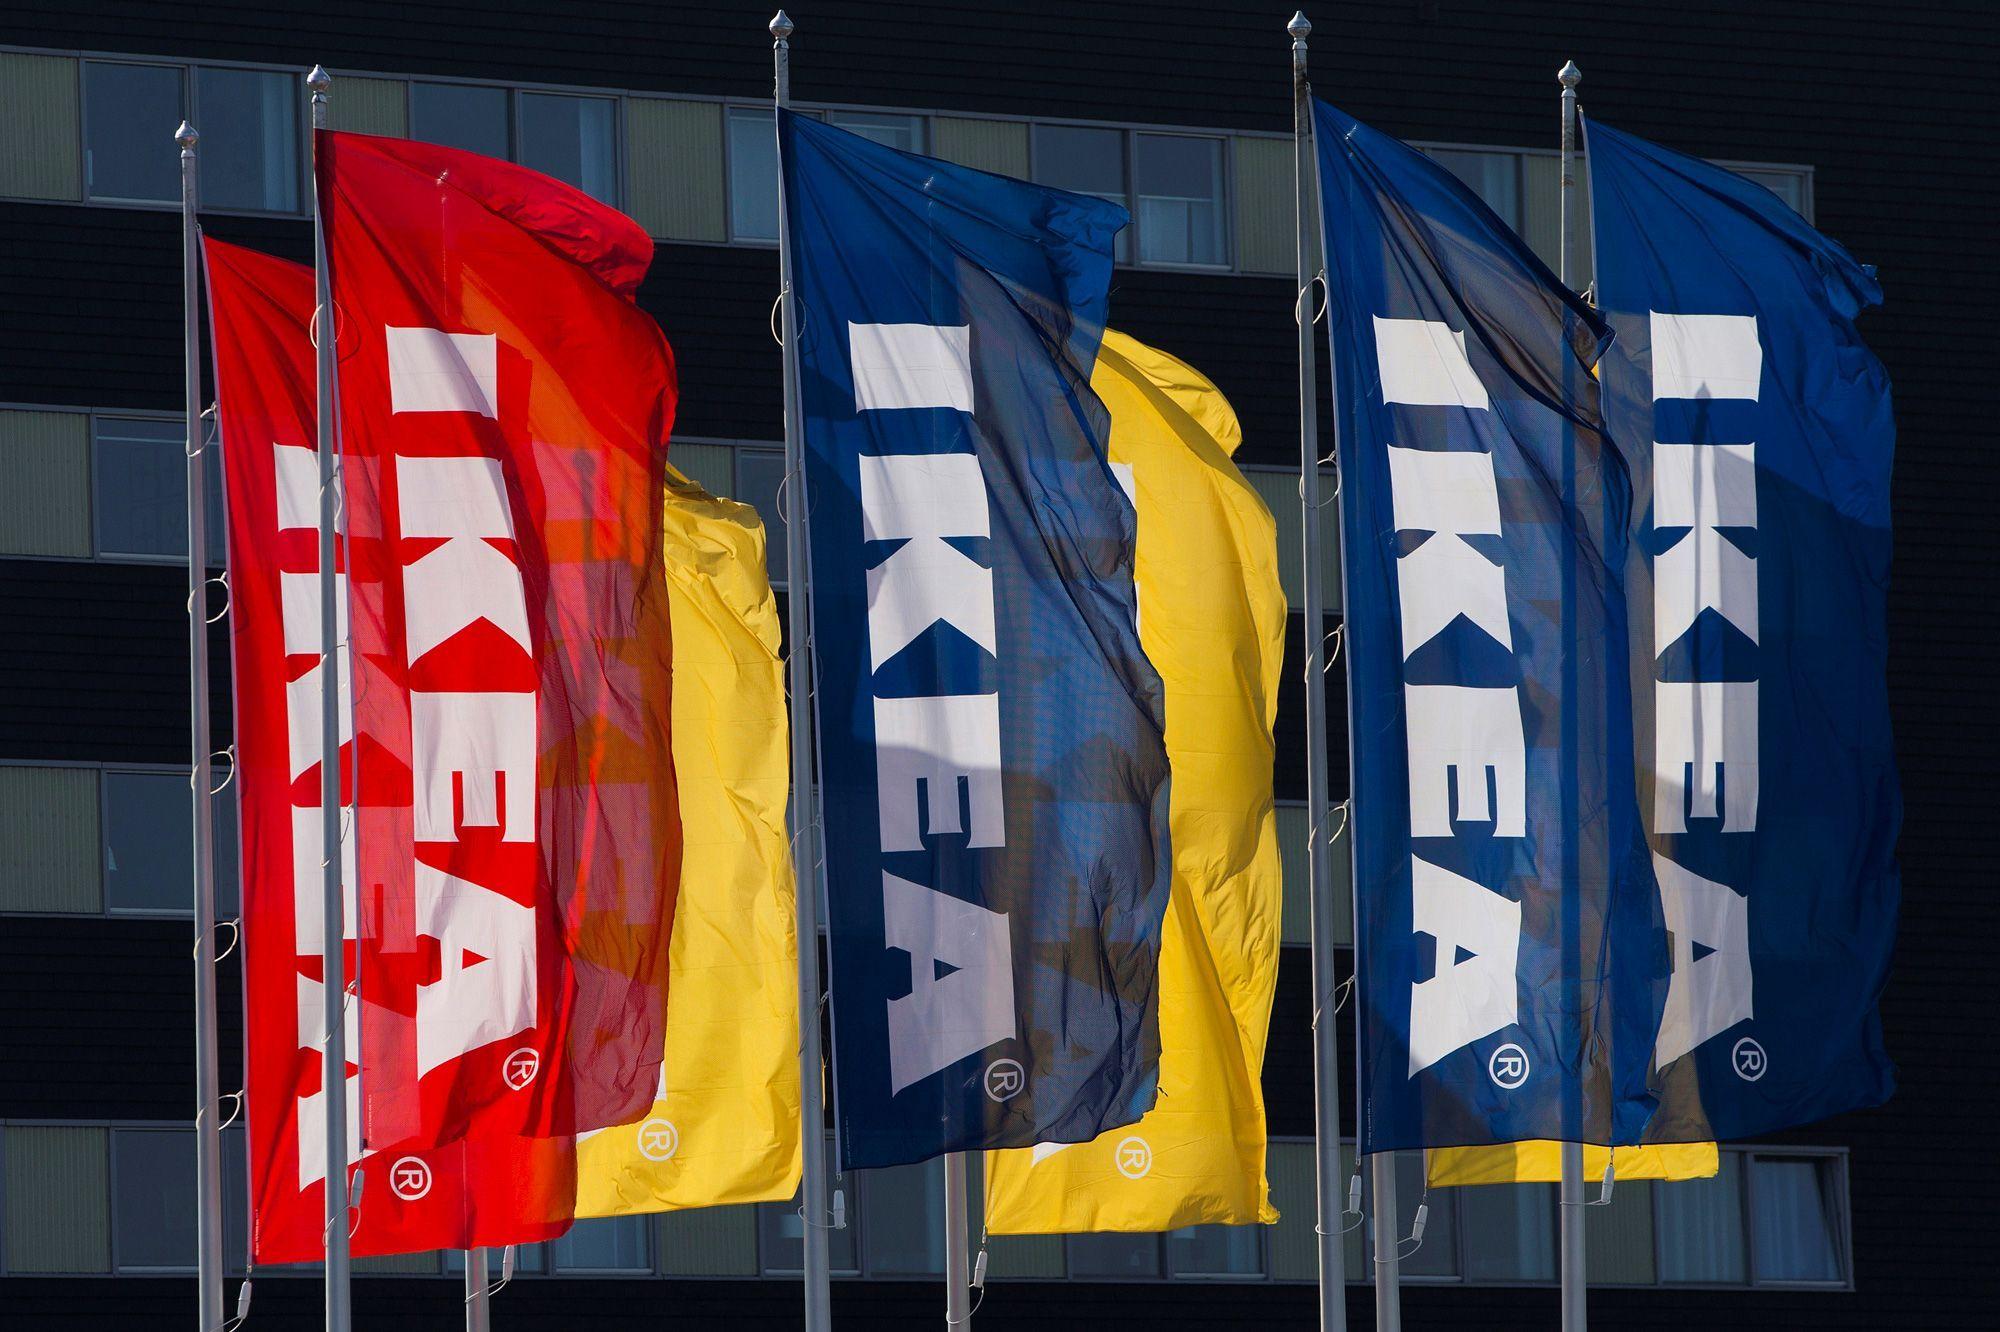 D'enfants Mort Va Ikea Dollars Payer Après Millions La Écrasés 50 De 9YeWHbE2DI